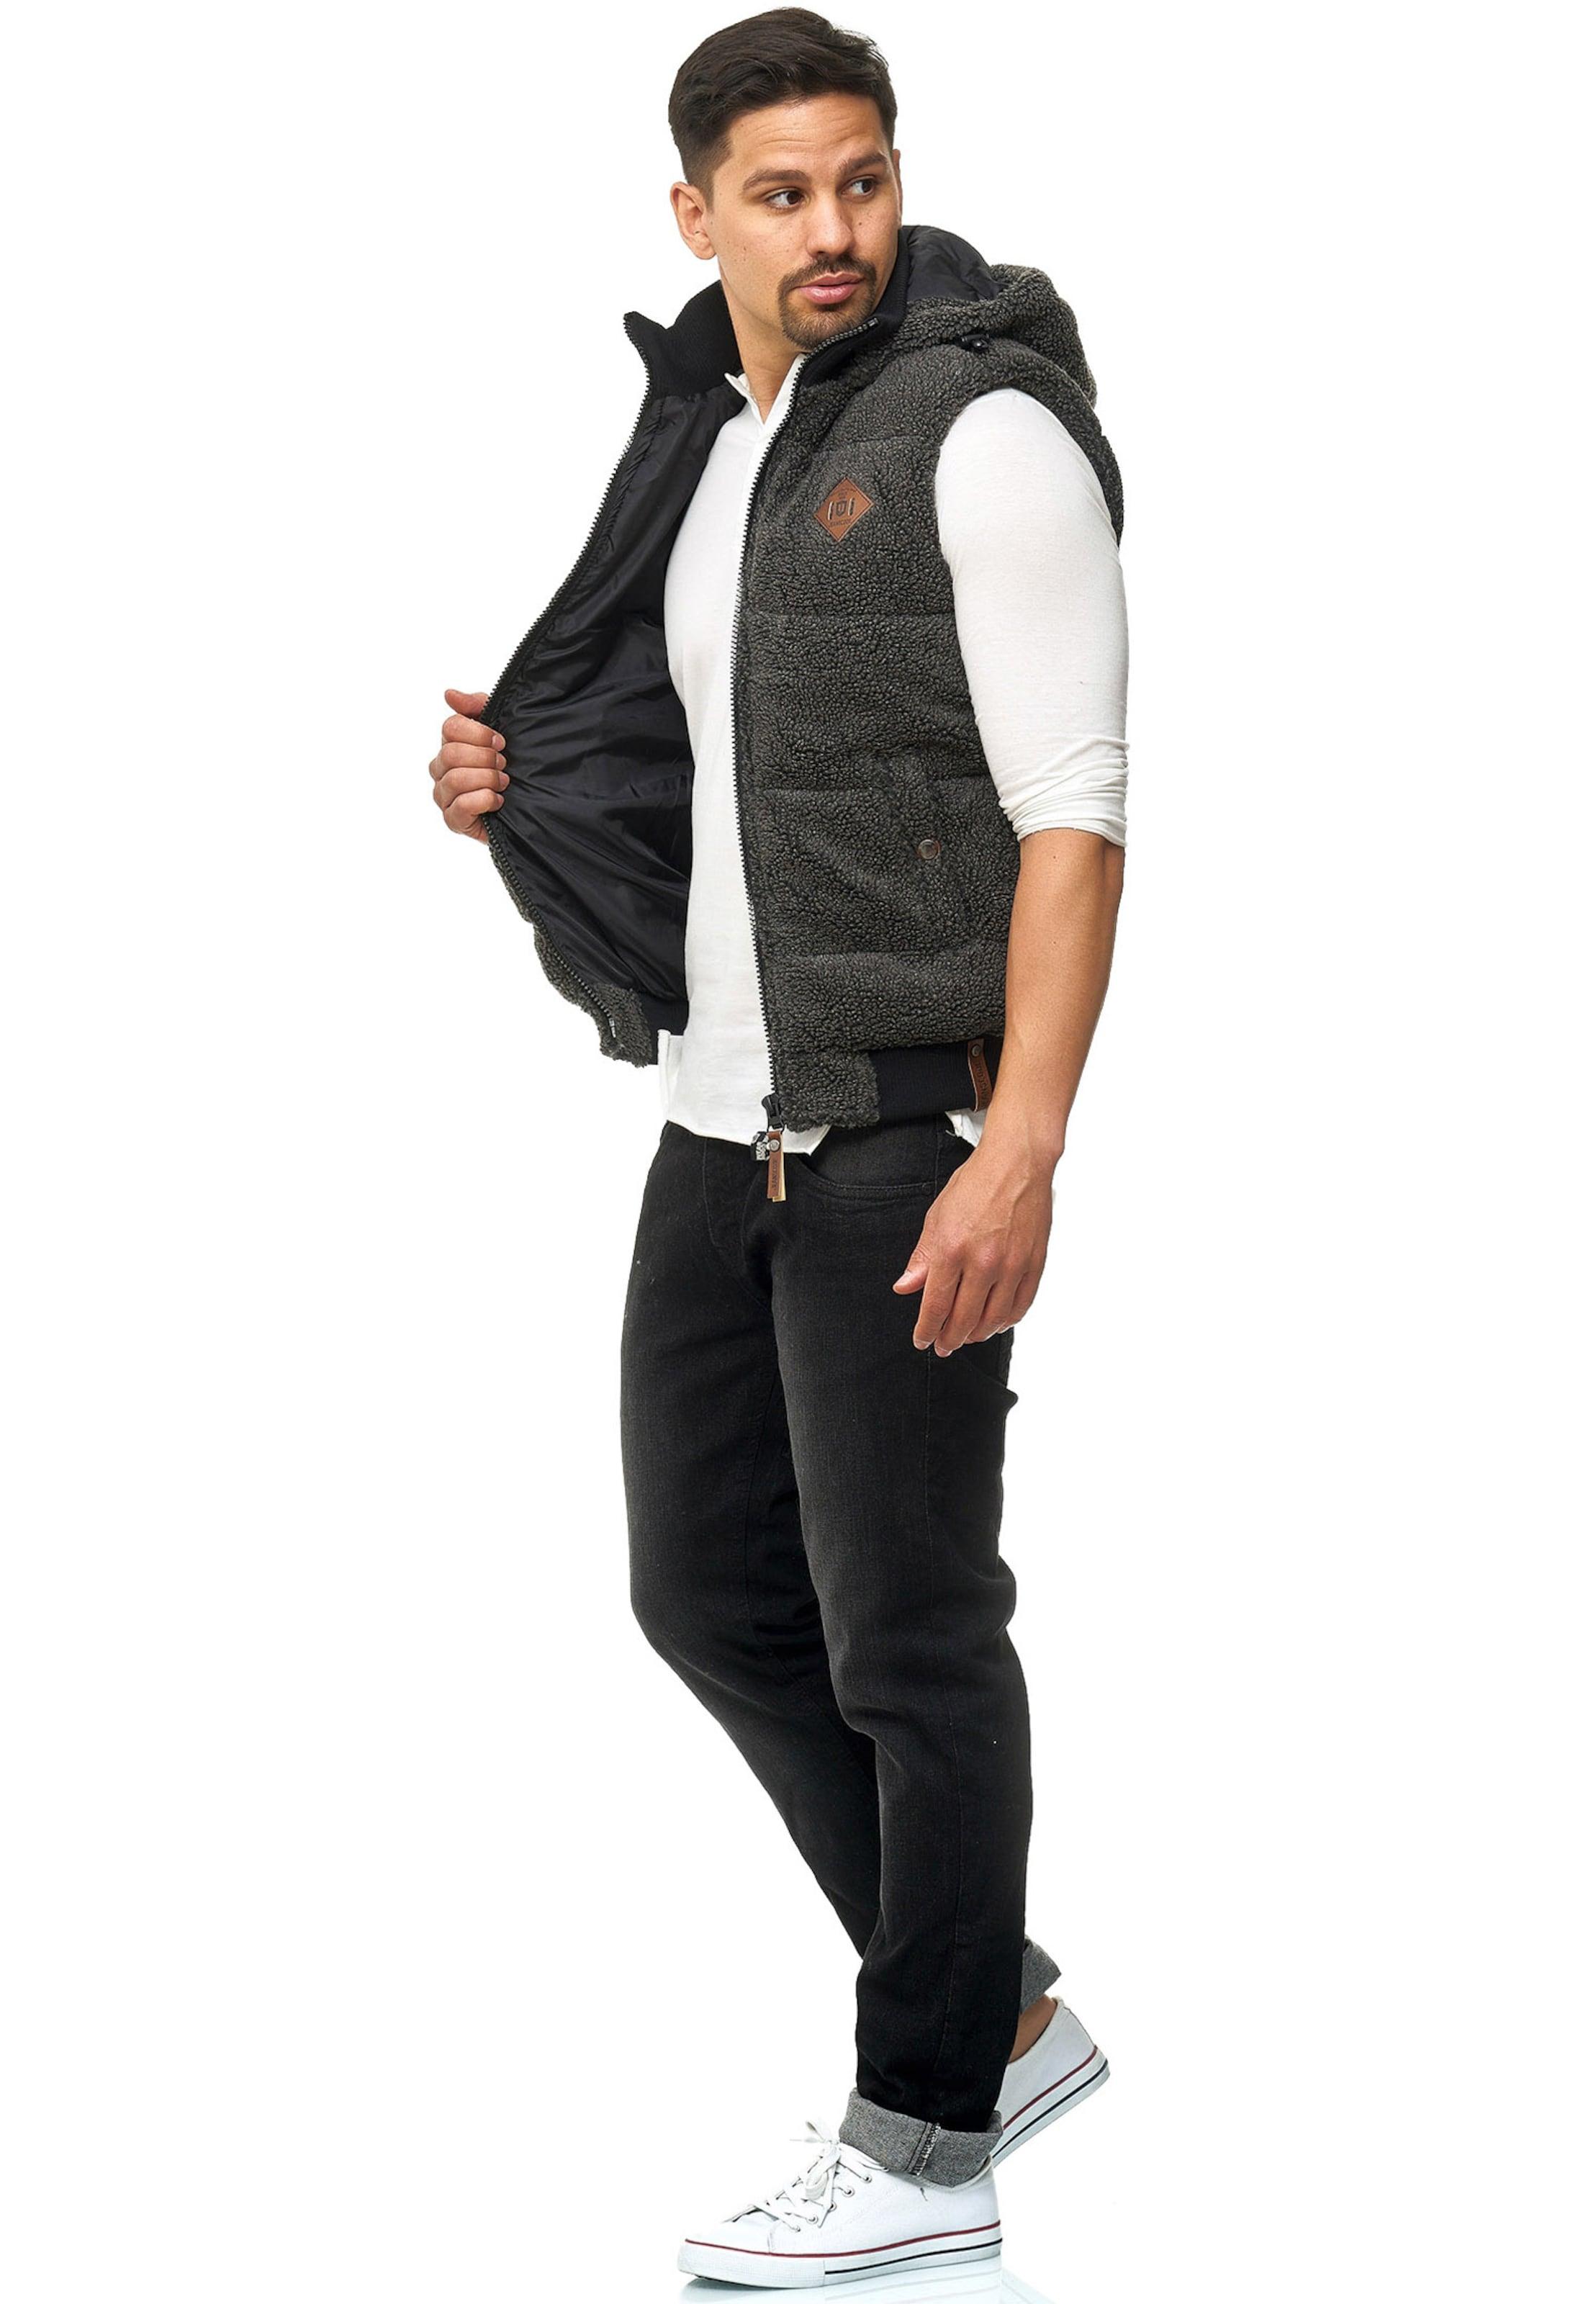 Hydes Jeans ' Gris En Indicode Gilet f6ymIvYb7g